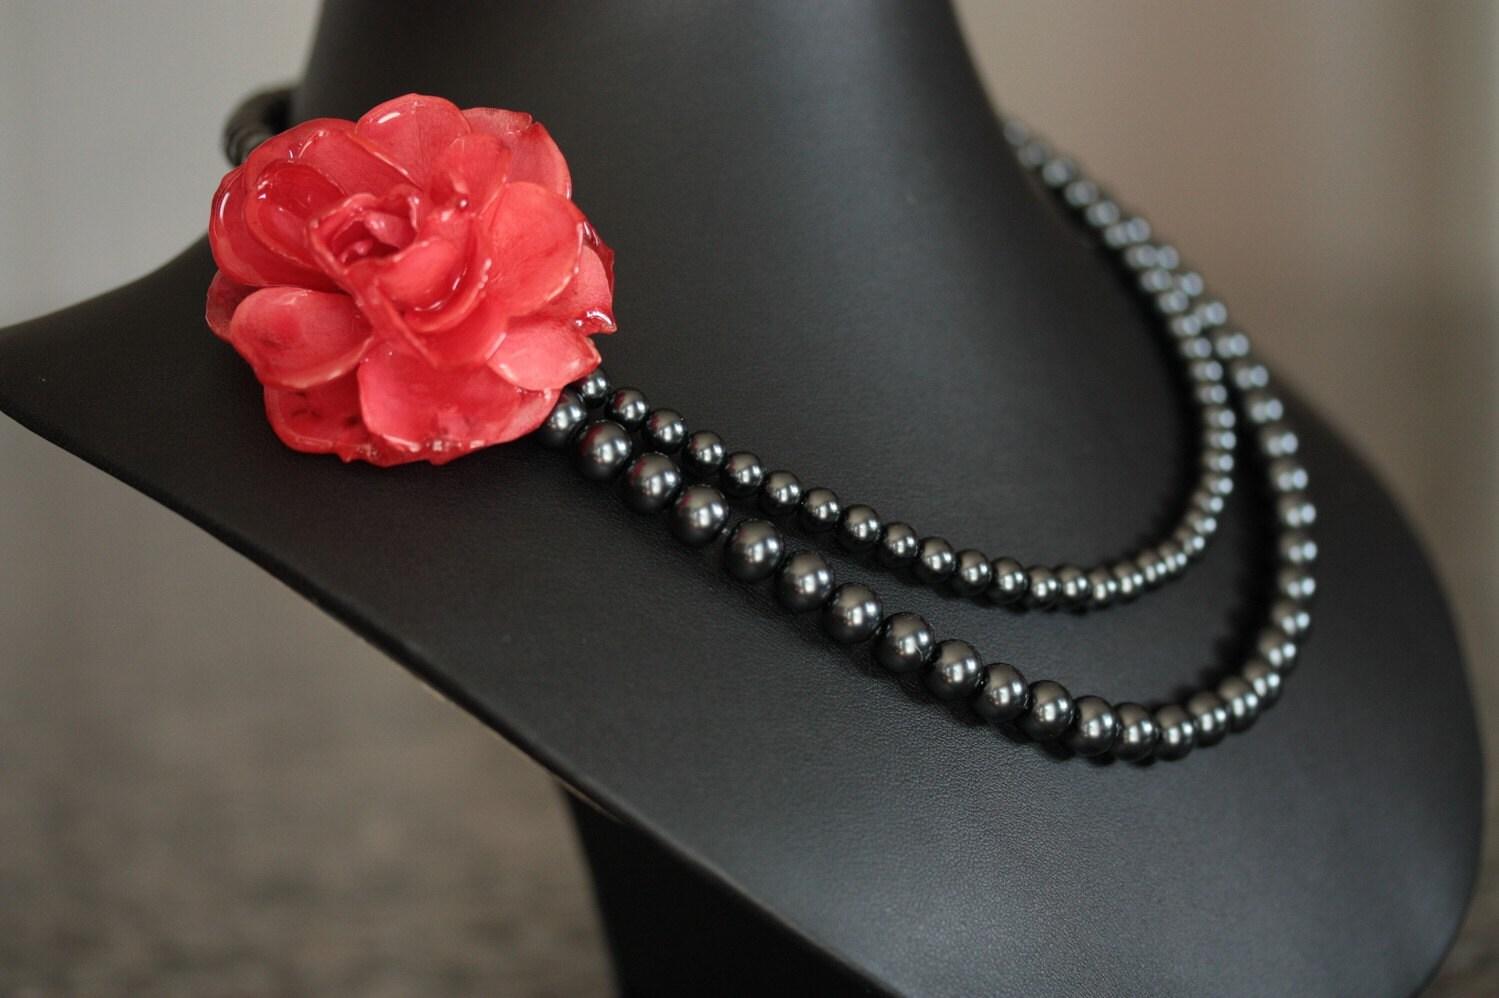 red rose and black pearl necklace. Black Bedroom Furniture Sets. Home Design Ideas